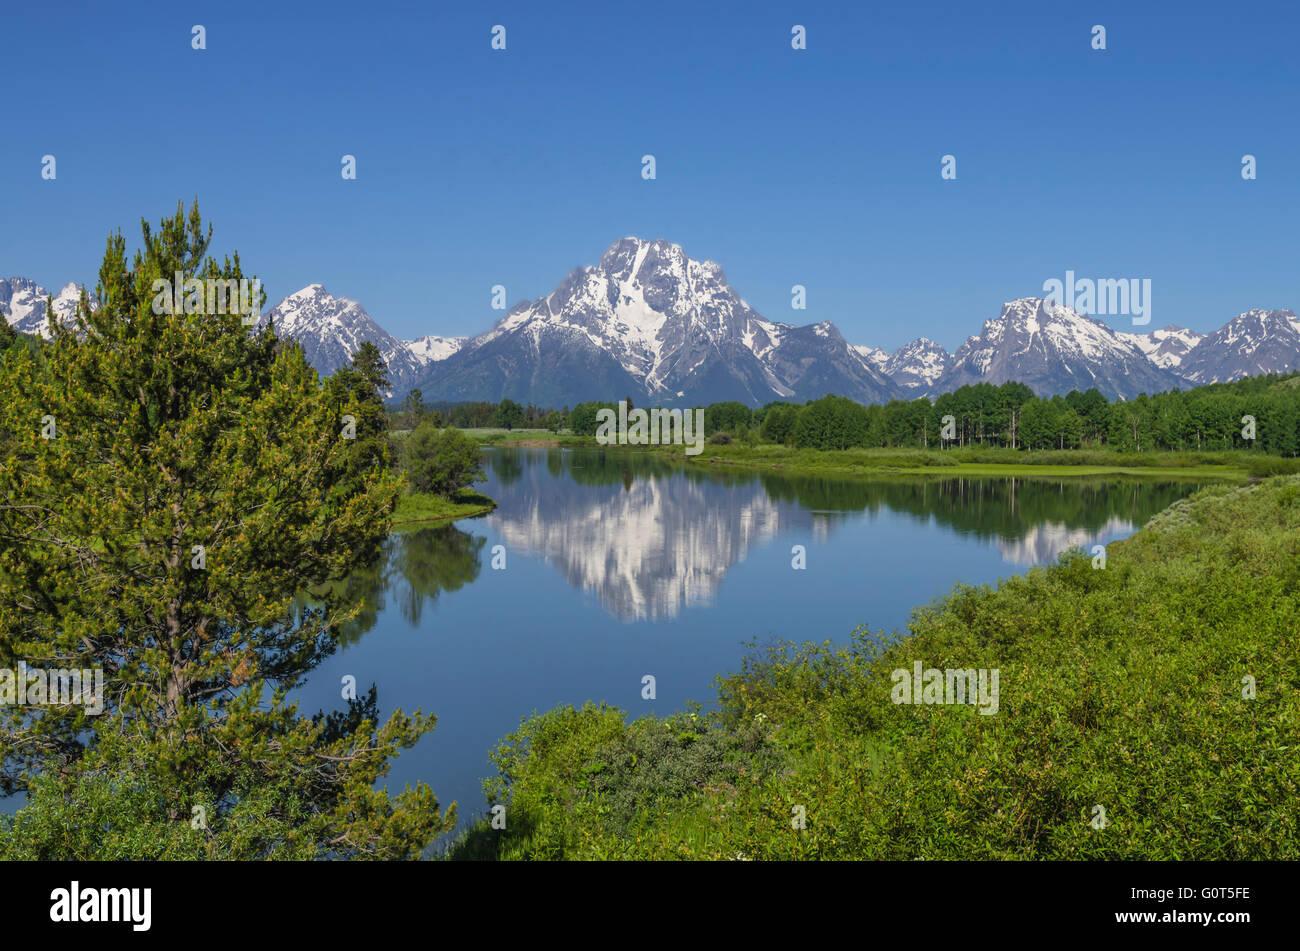 Mount Moran. Oxbow Bend. Teton National Park. Wyoming. USA - Stock Image